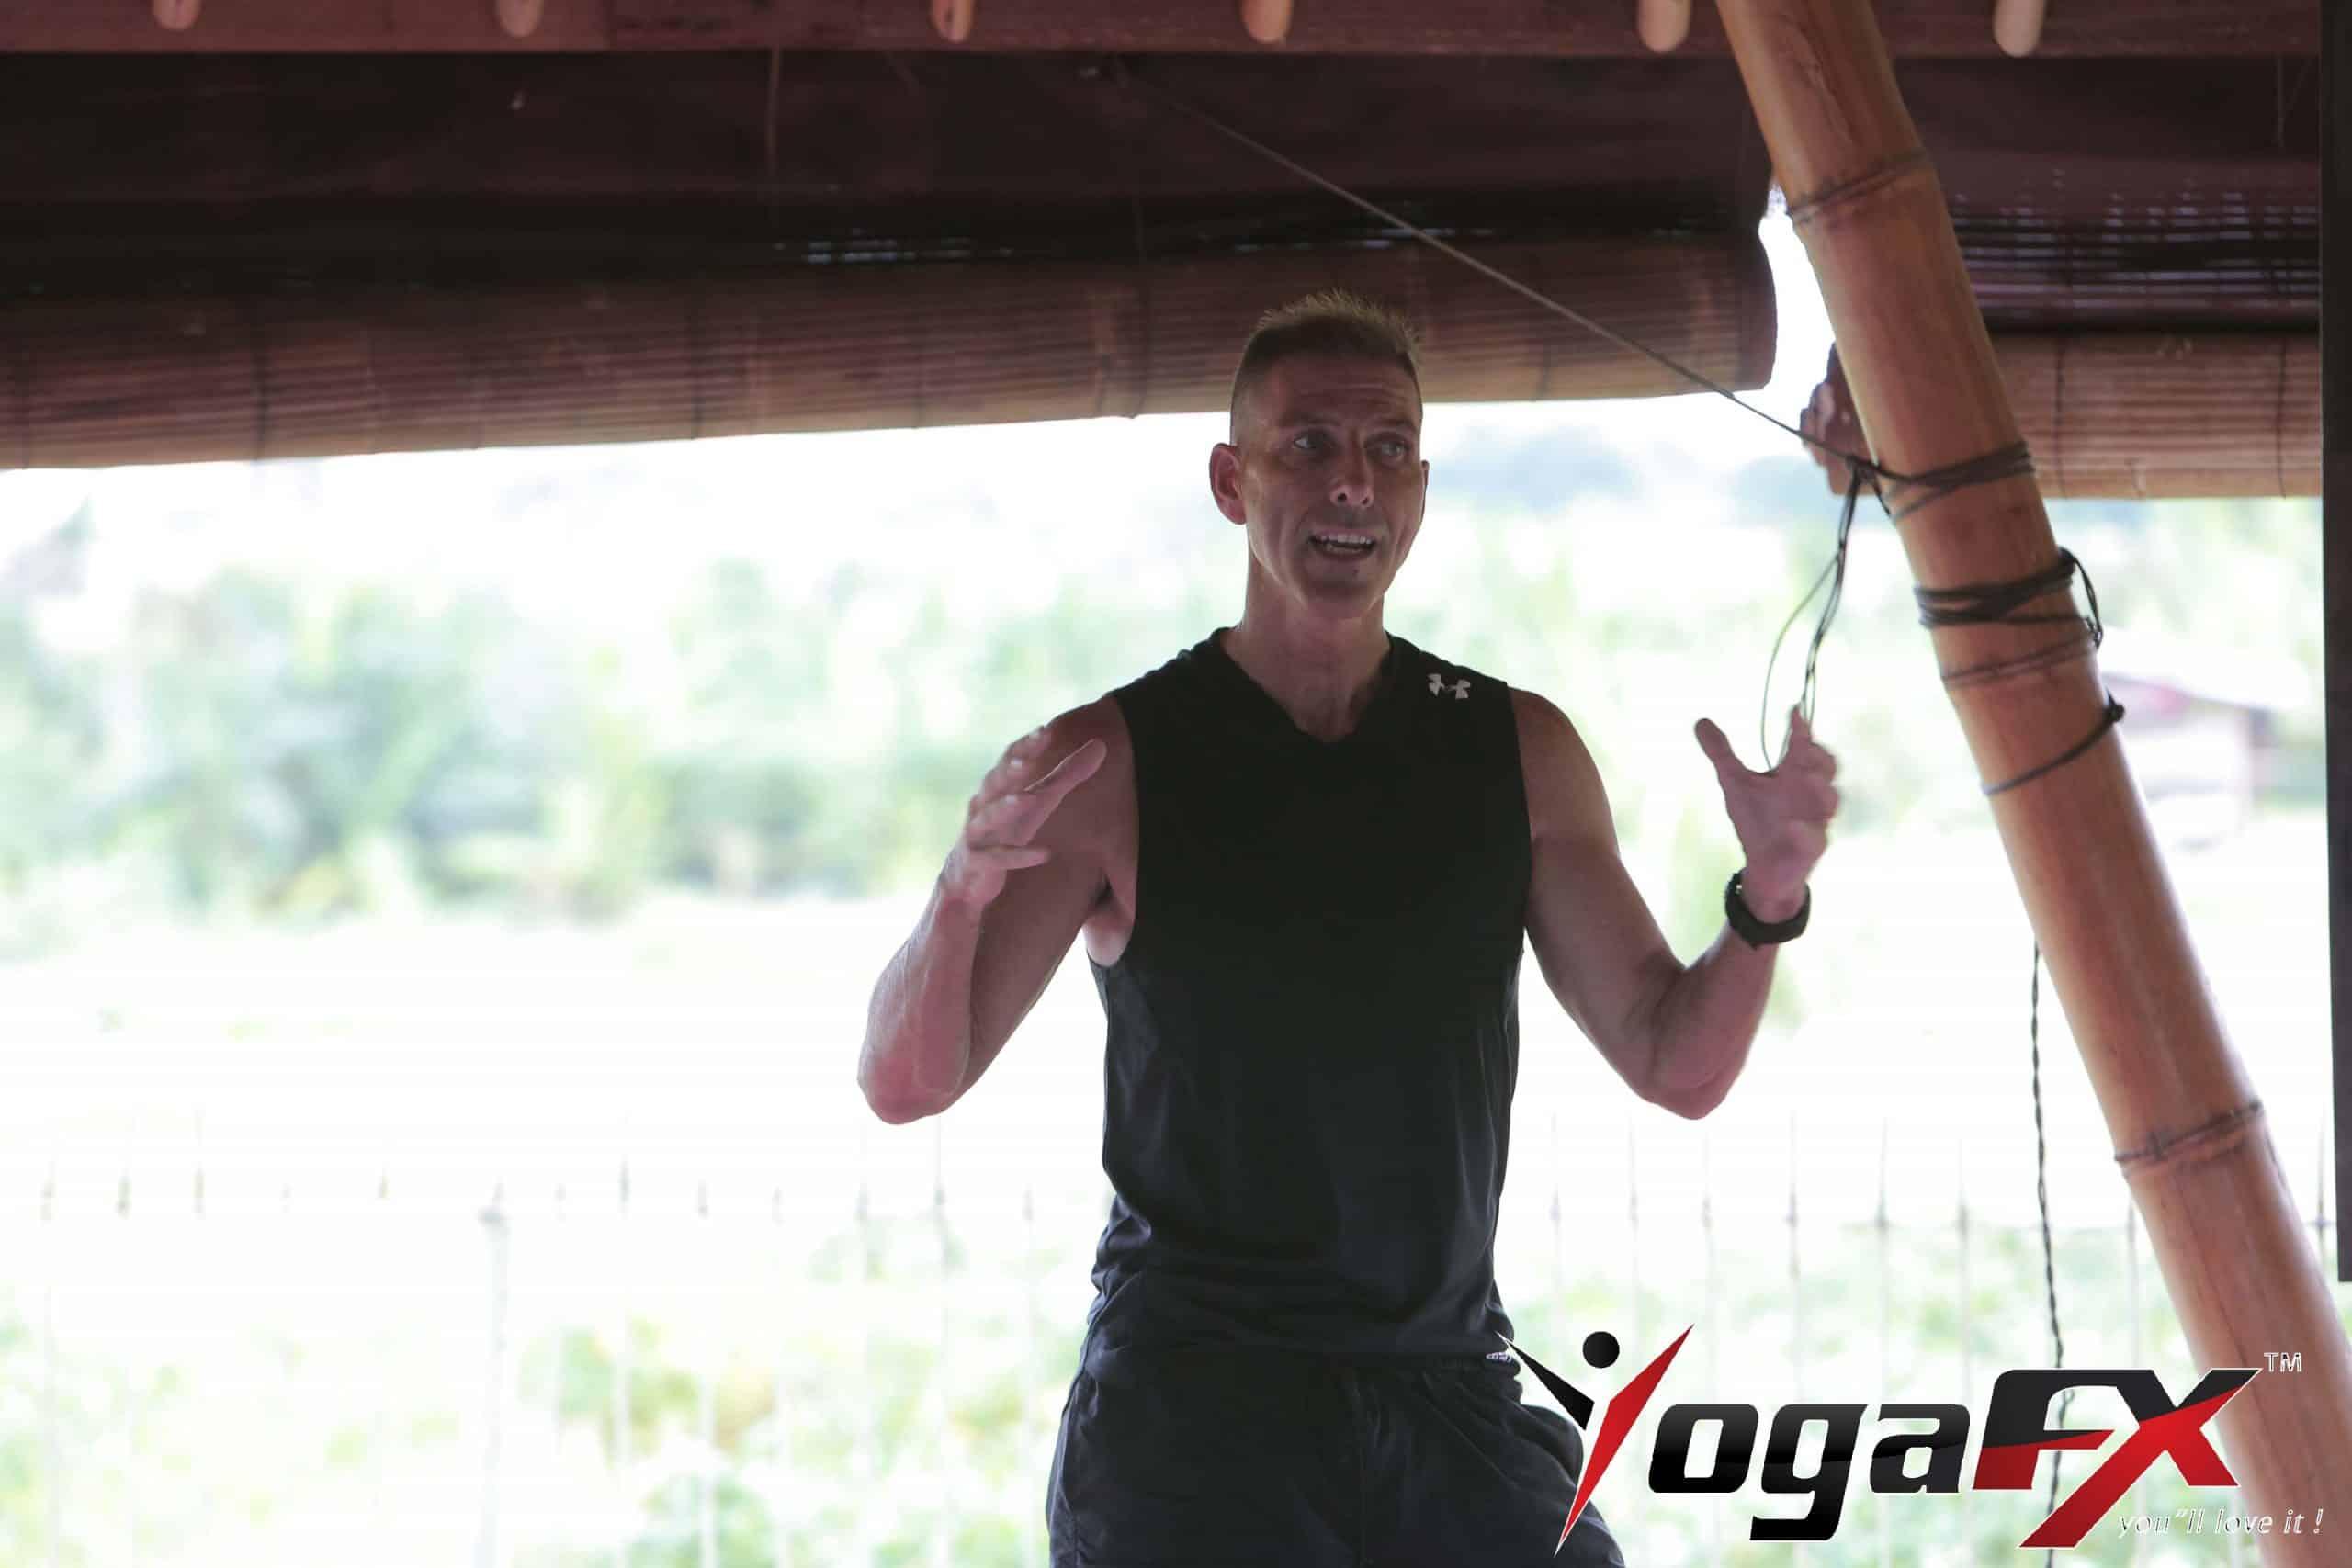 bikram yoga teaching